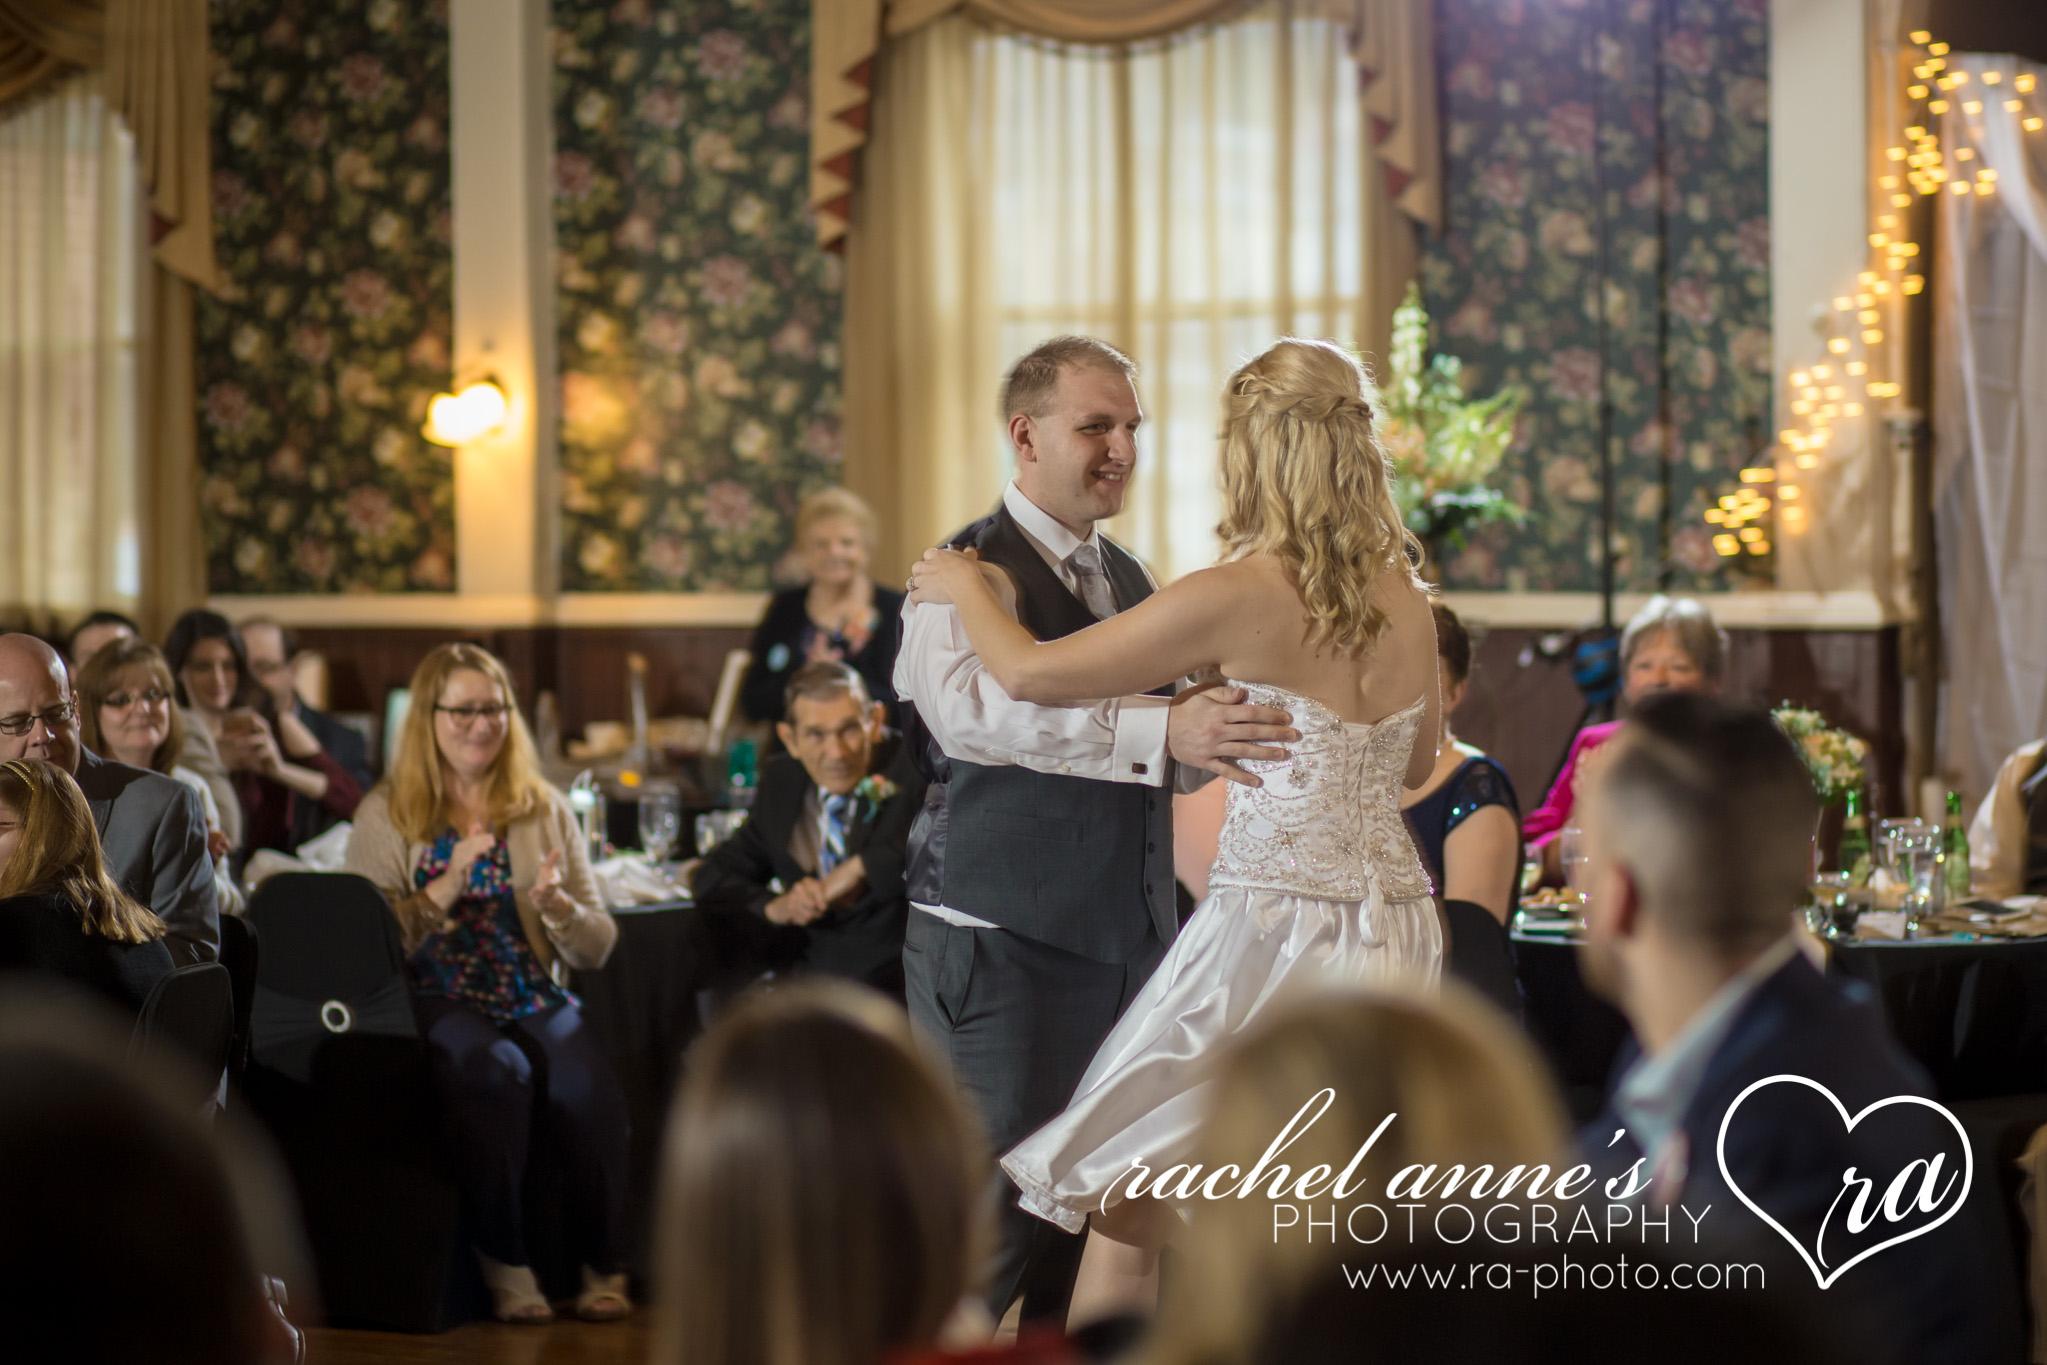 057-JKS-WEDDINGS-THE-FRANKLIN-PA.jpg